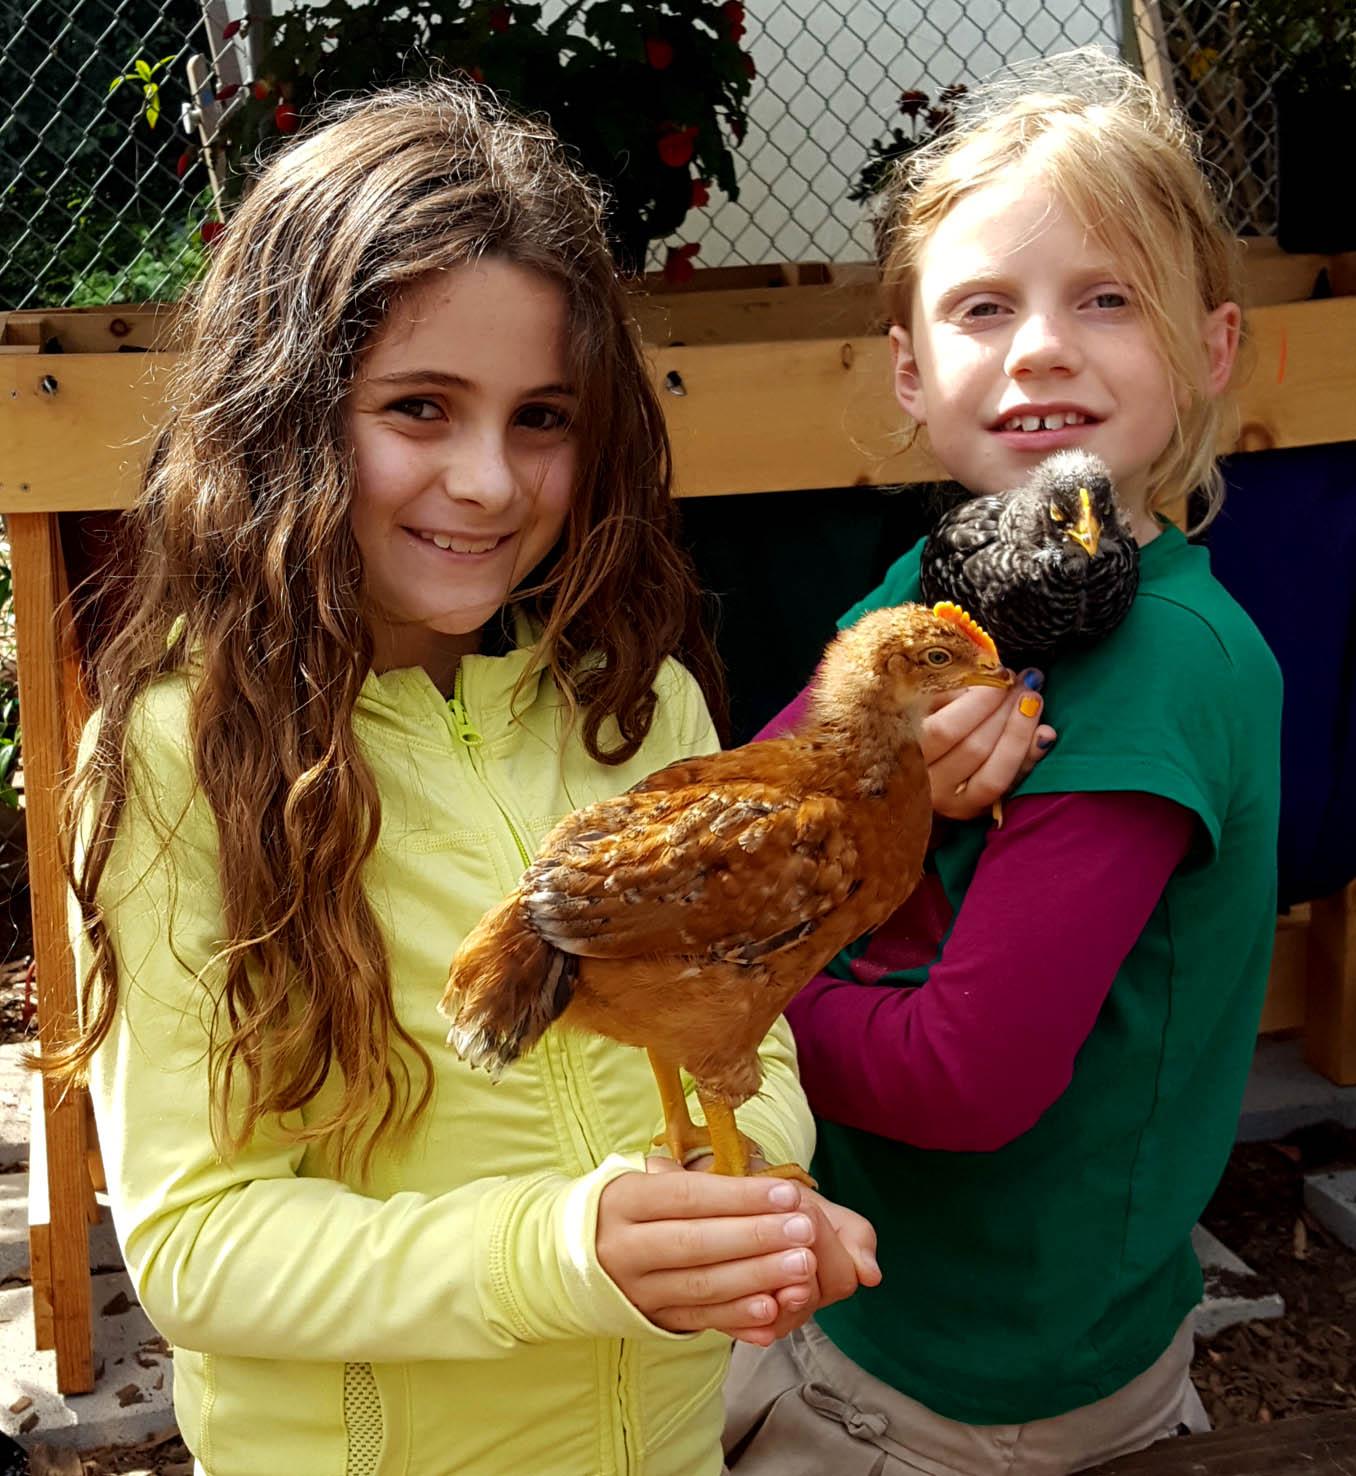 chickens_chicks_week4_lexie_jojo_copper_starlight_edited